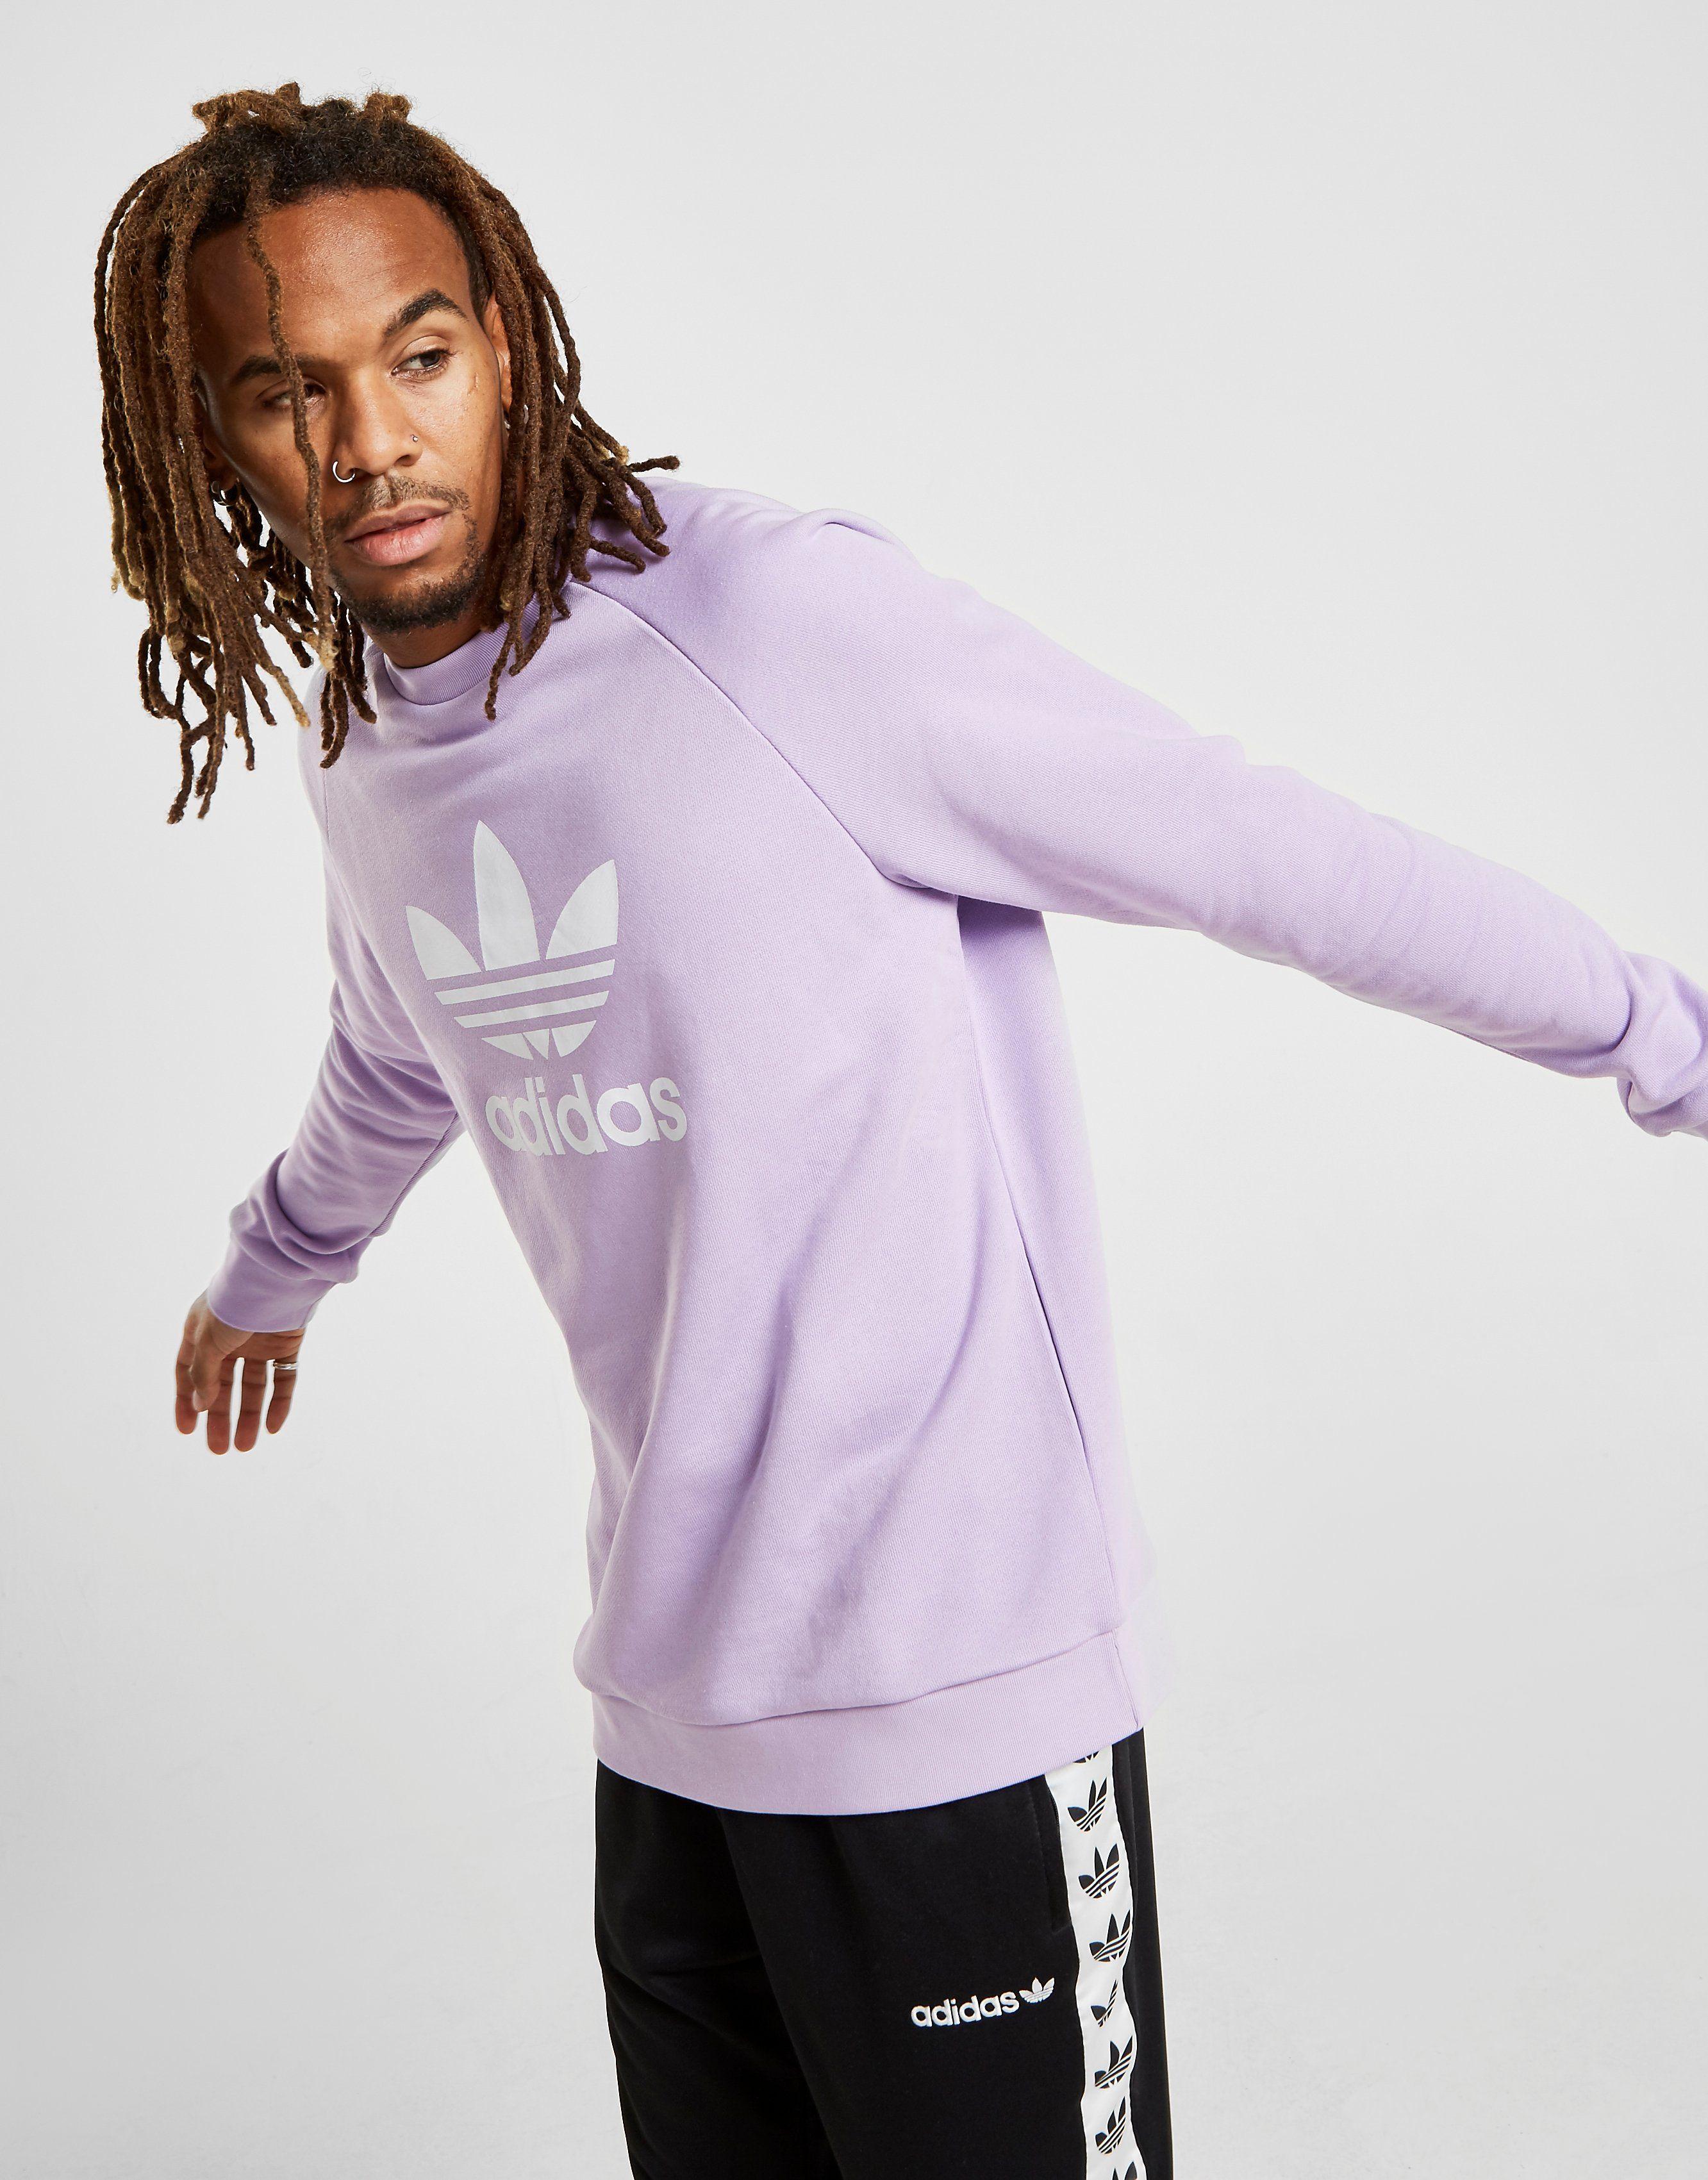 651616a798ab Adidas Originals Trefoil Crew Sweatshirt Pink - raveitsafe